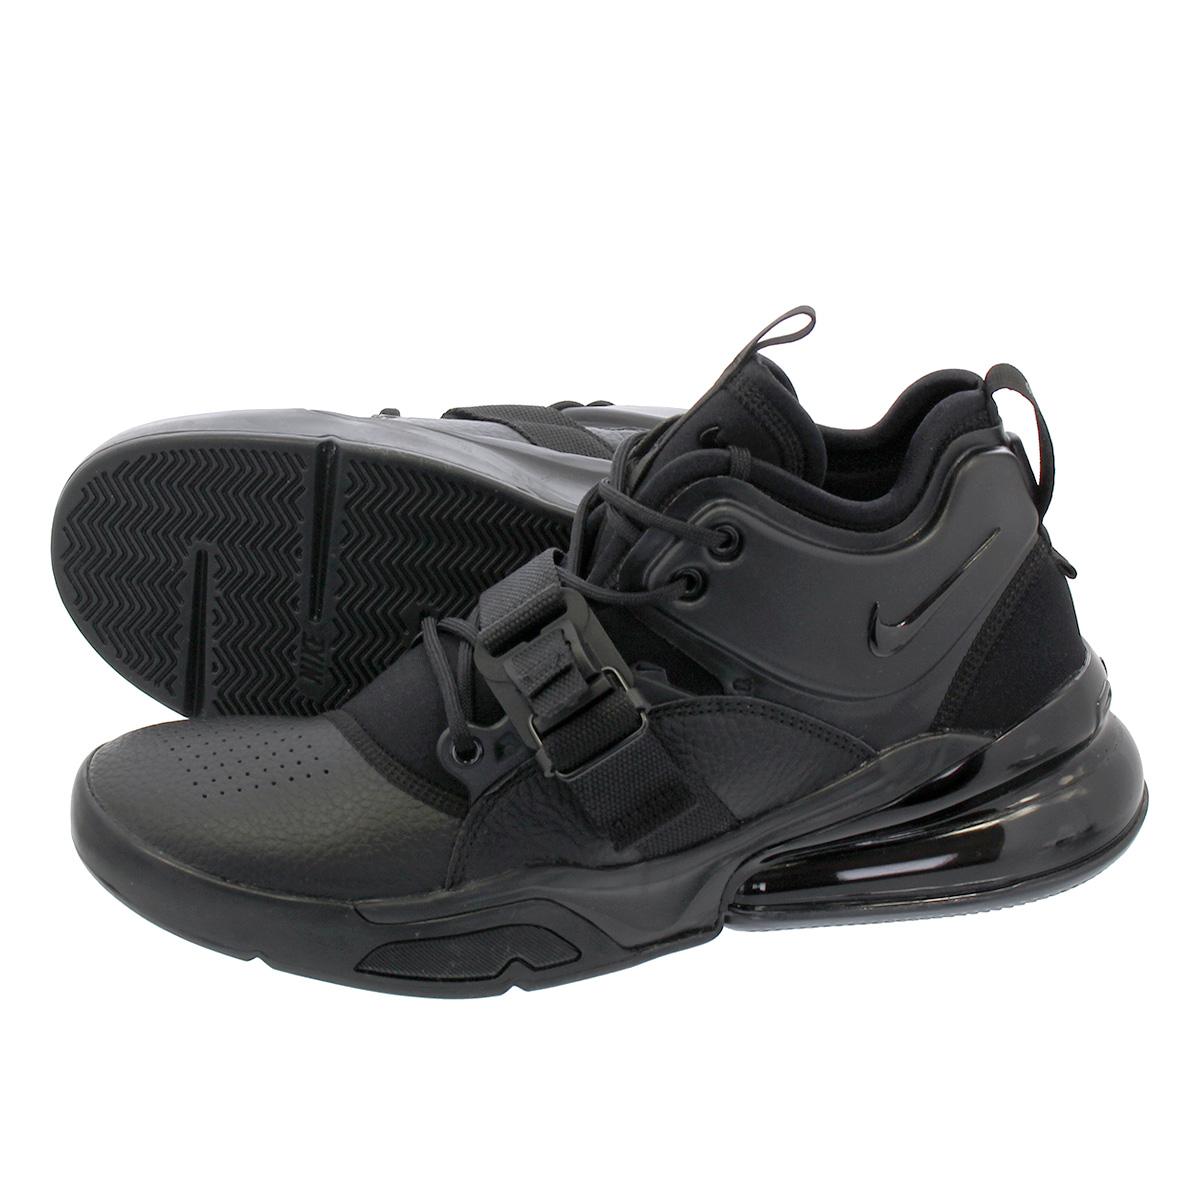 NIKE AIR FORCE 270 Nike air force 270 BLACKBLACKBLACK ah6772 010